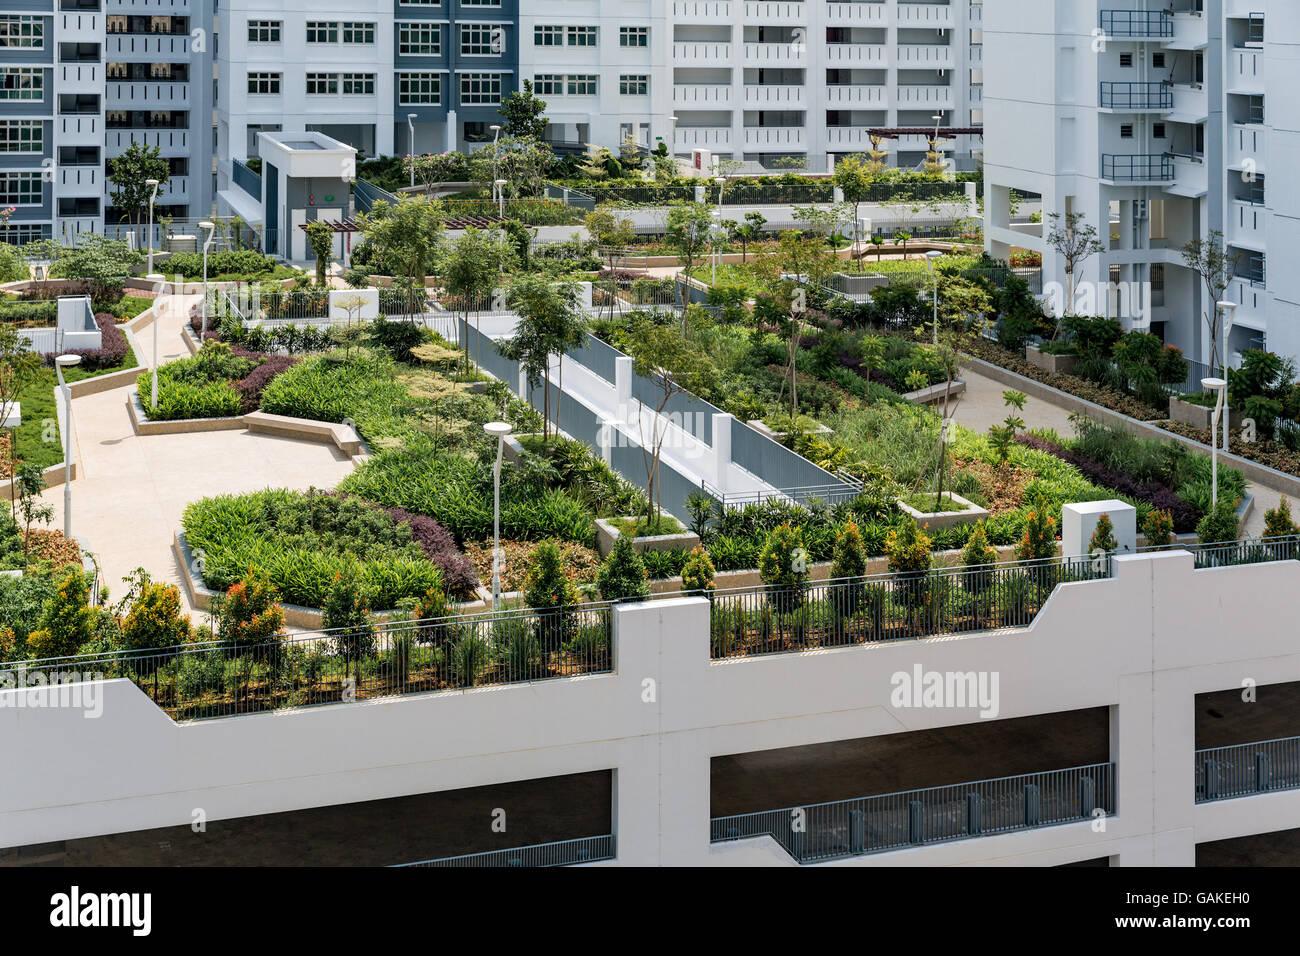 Roof Top Garden Above Car Park In New Singapore Public Housing Development Board Apartment Blocks